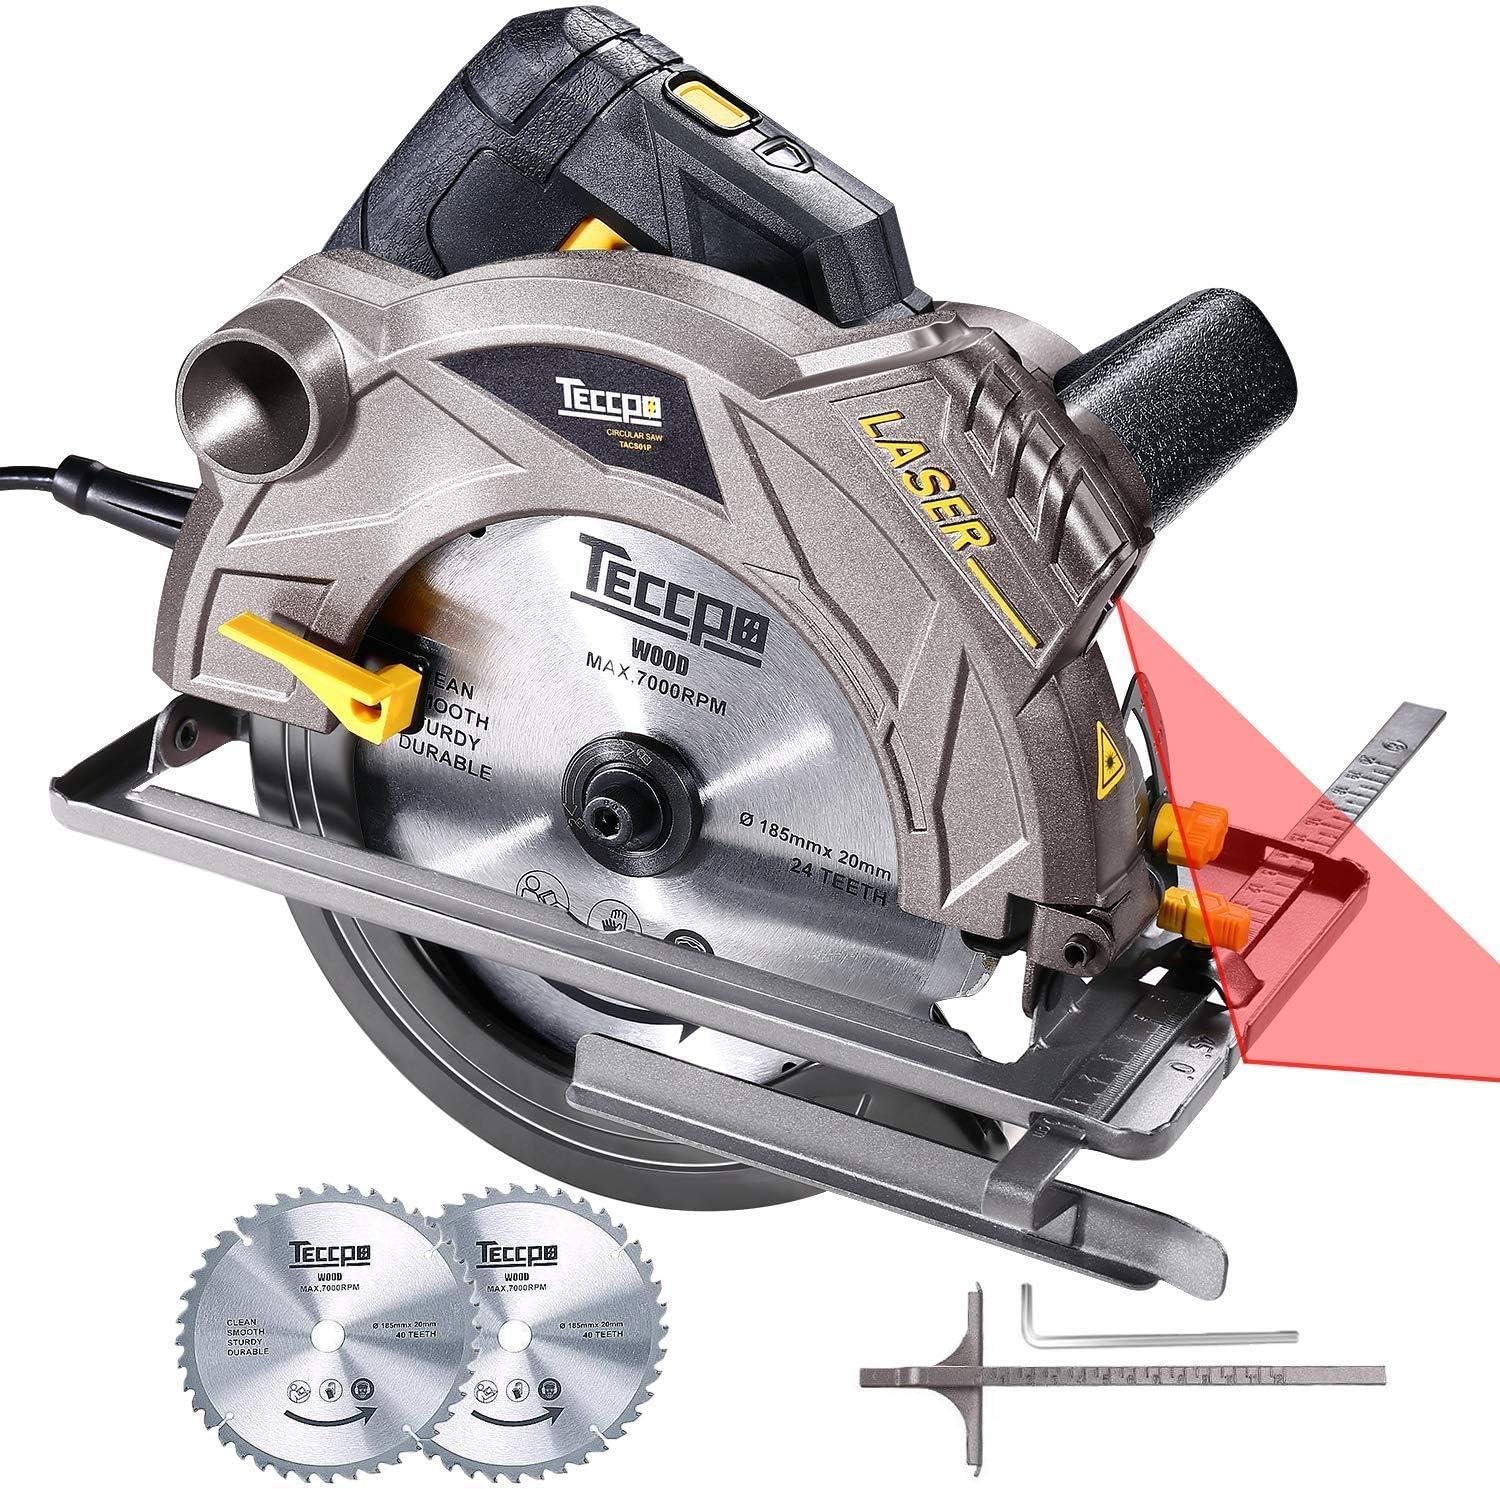 TECCPO TACS22P Professional Circular Saw